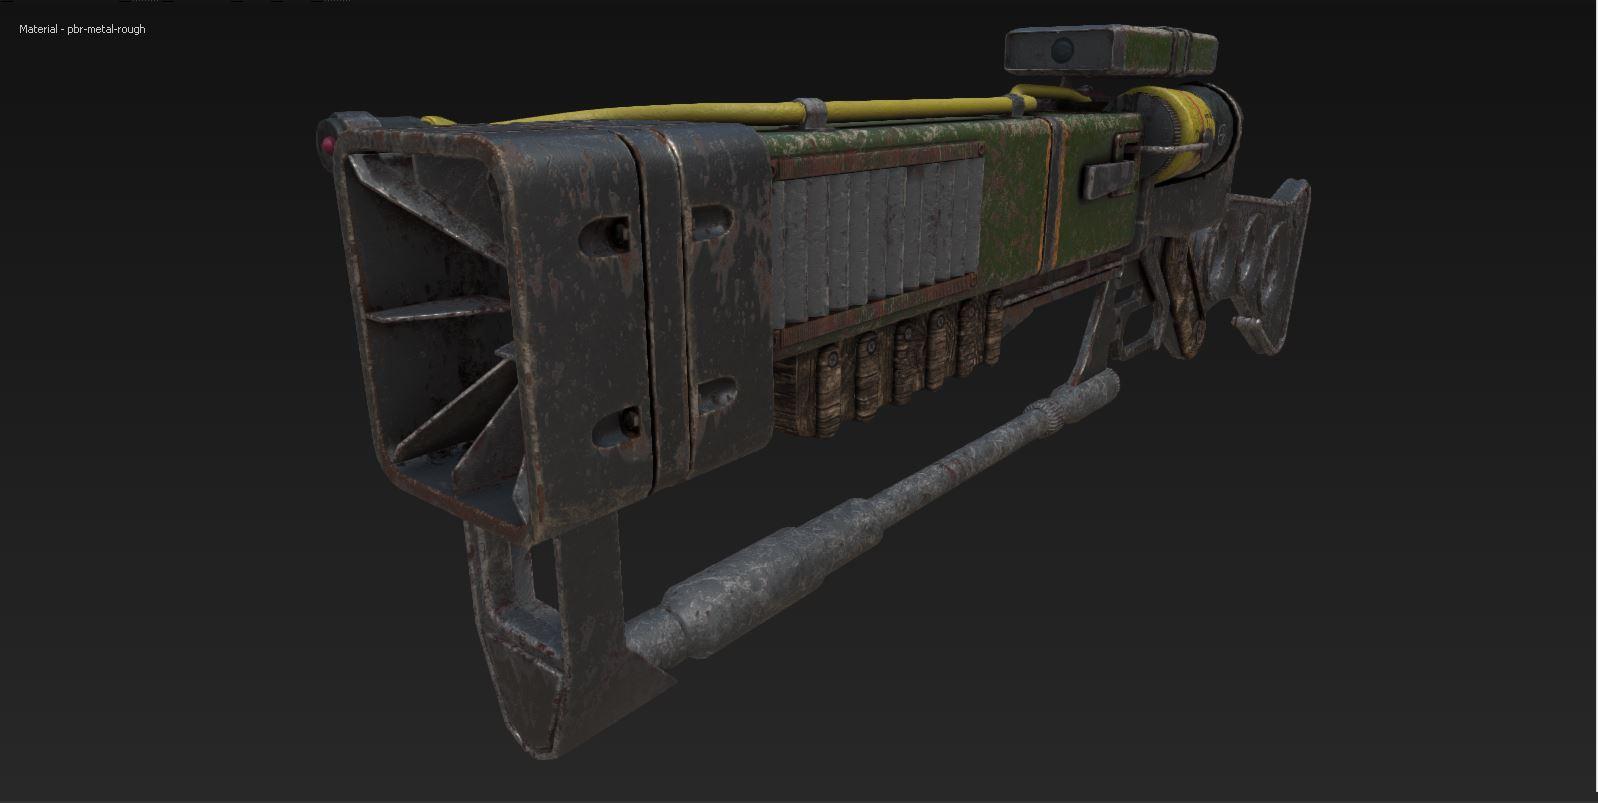 Fallout AER 9 laser rifle